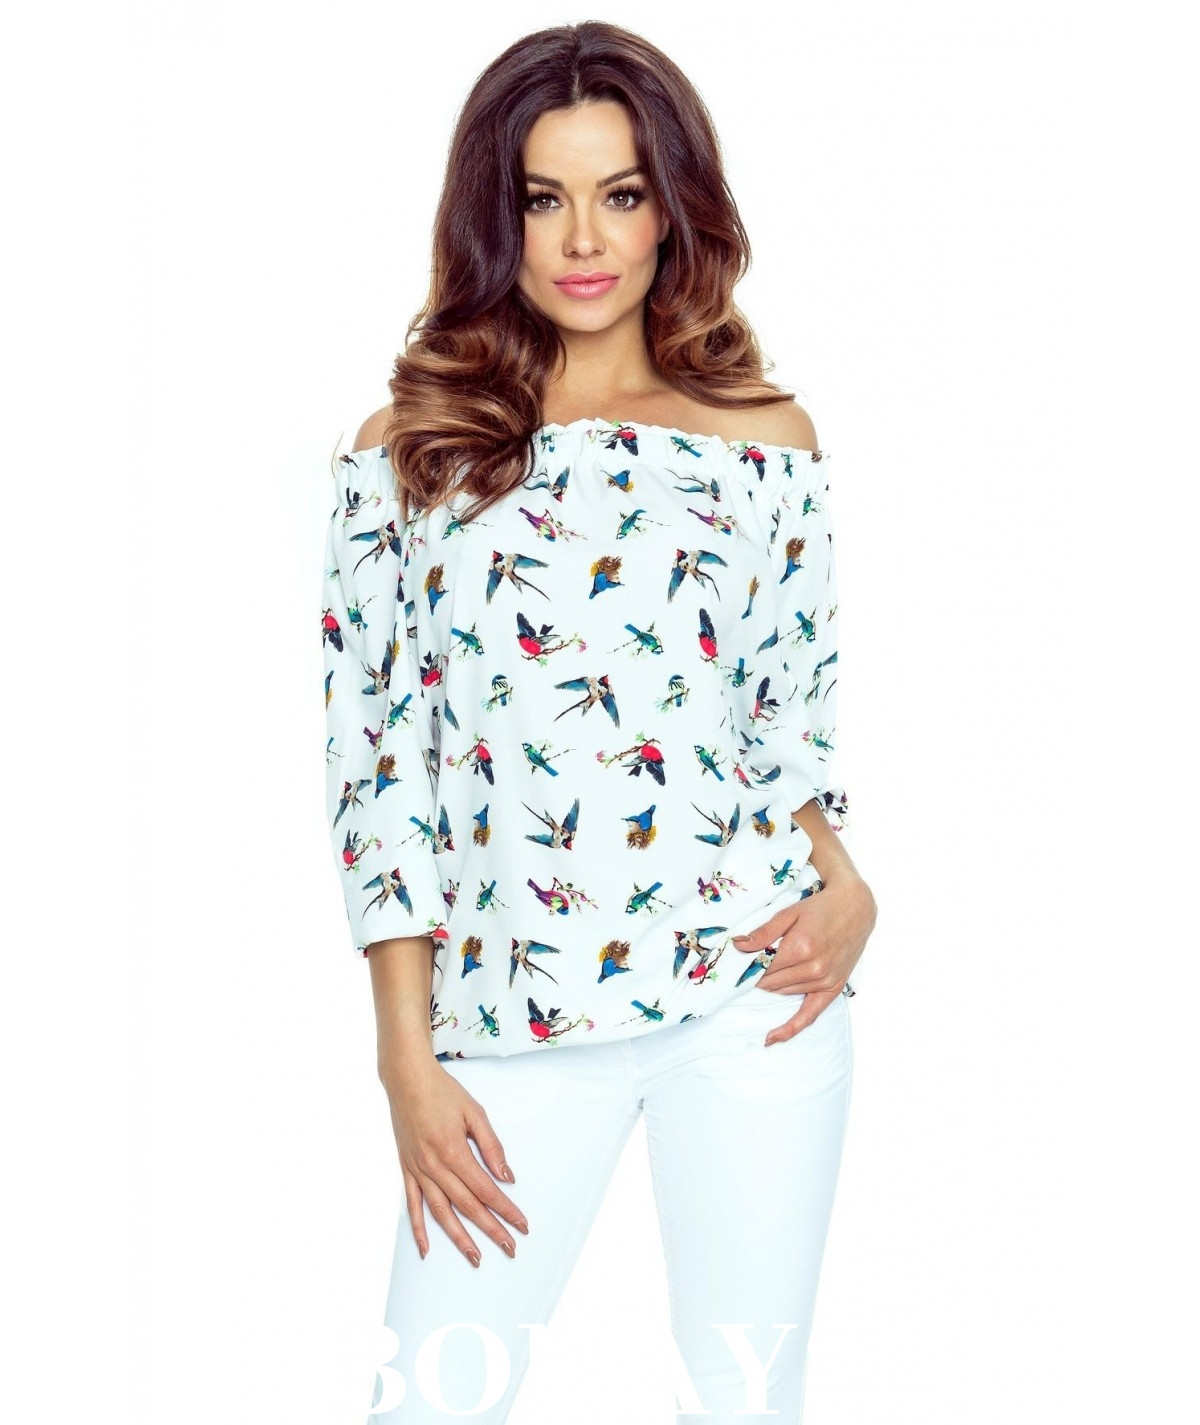 Elegancka bluzka z prontem w ptaki crossy